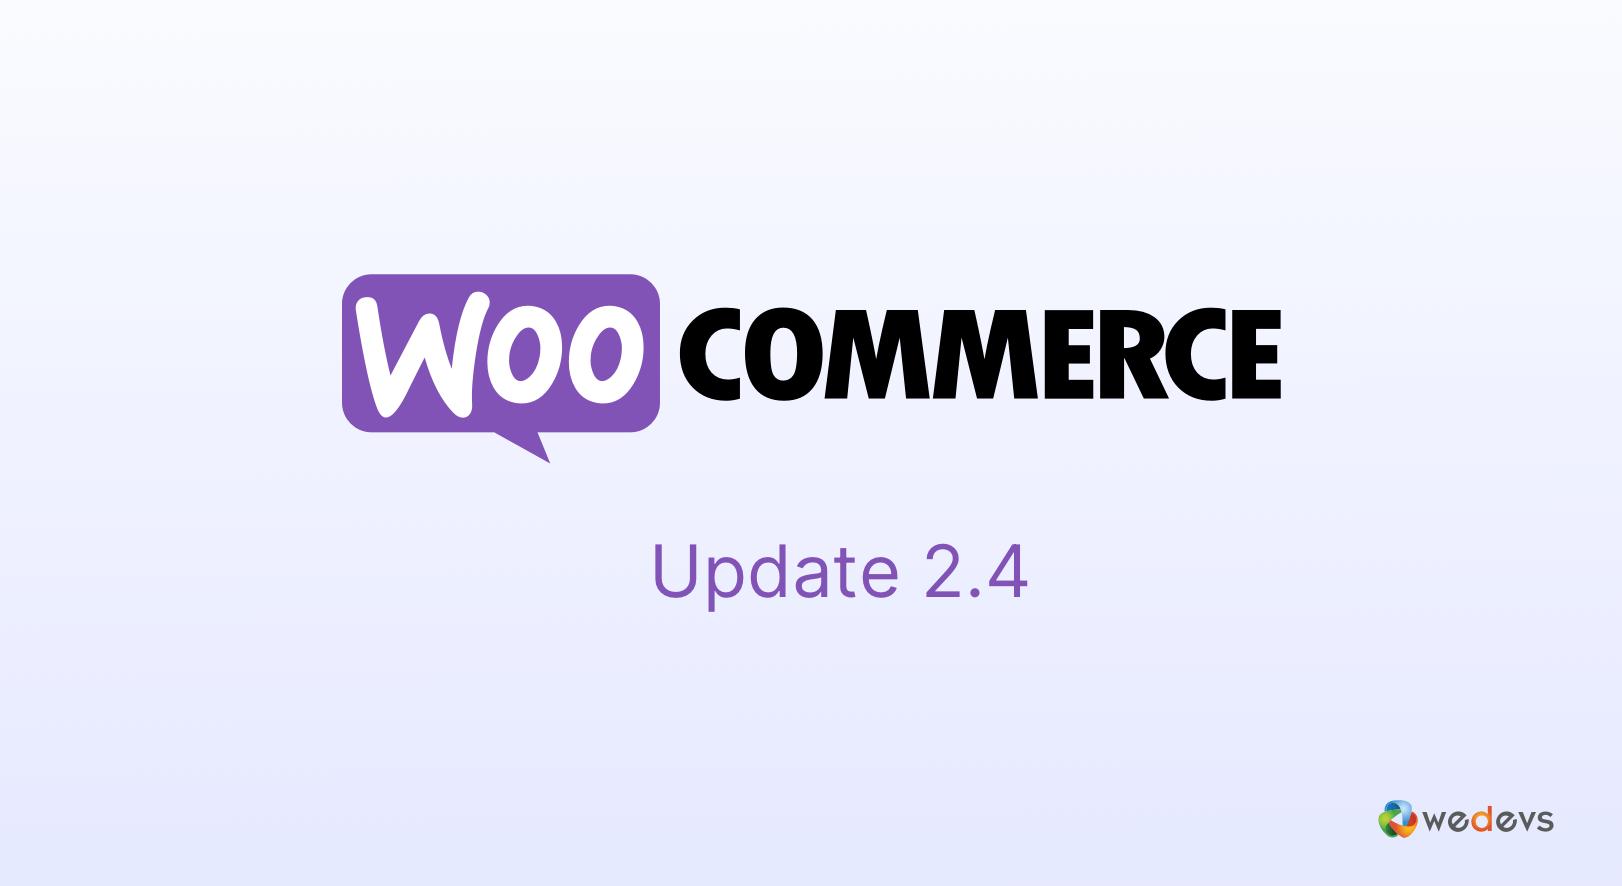 WooCommerce 2.4 is here!